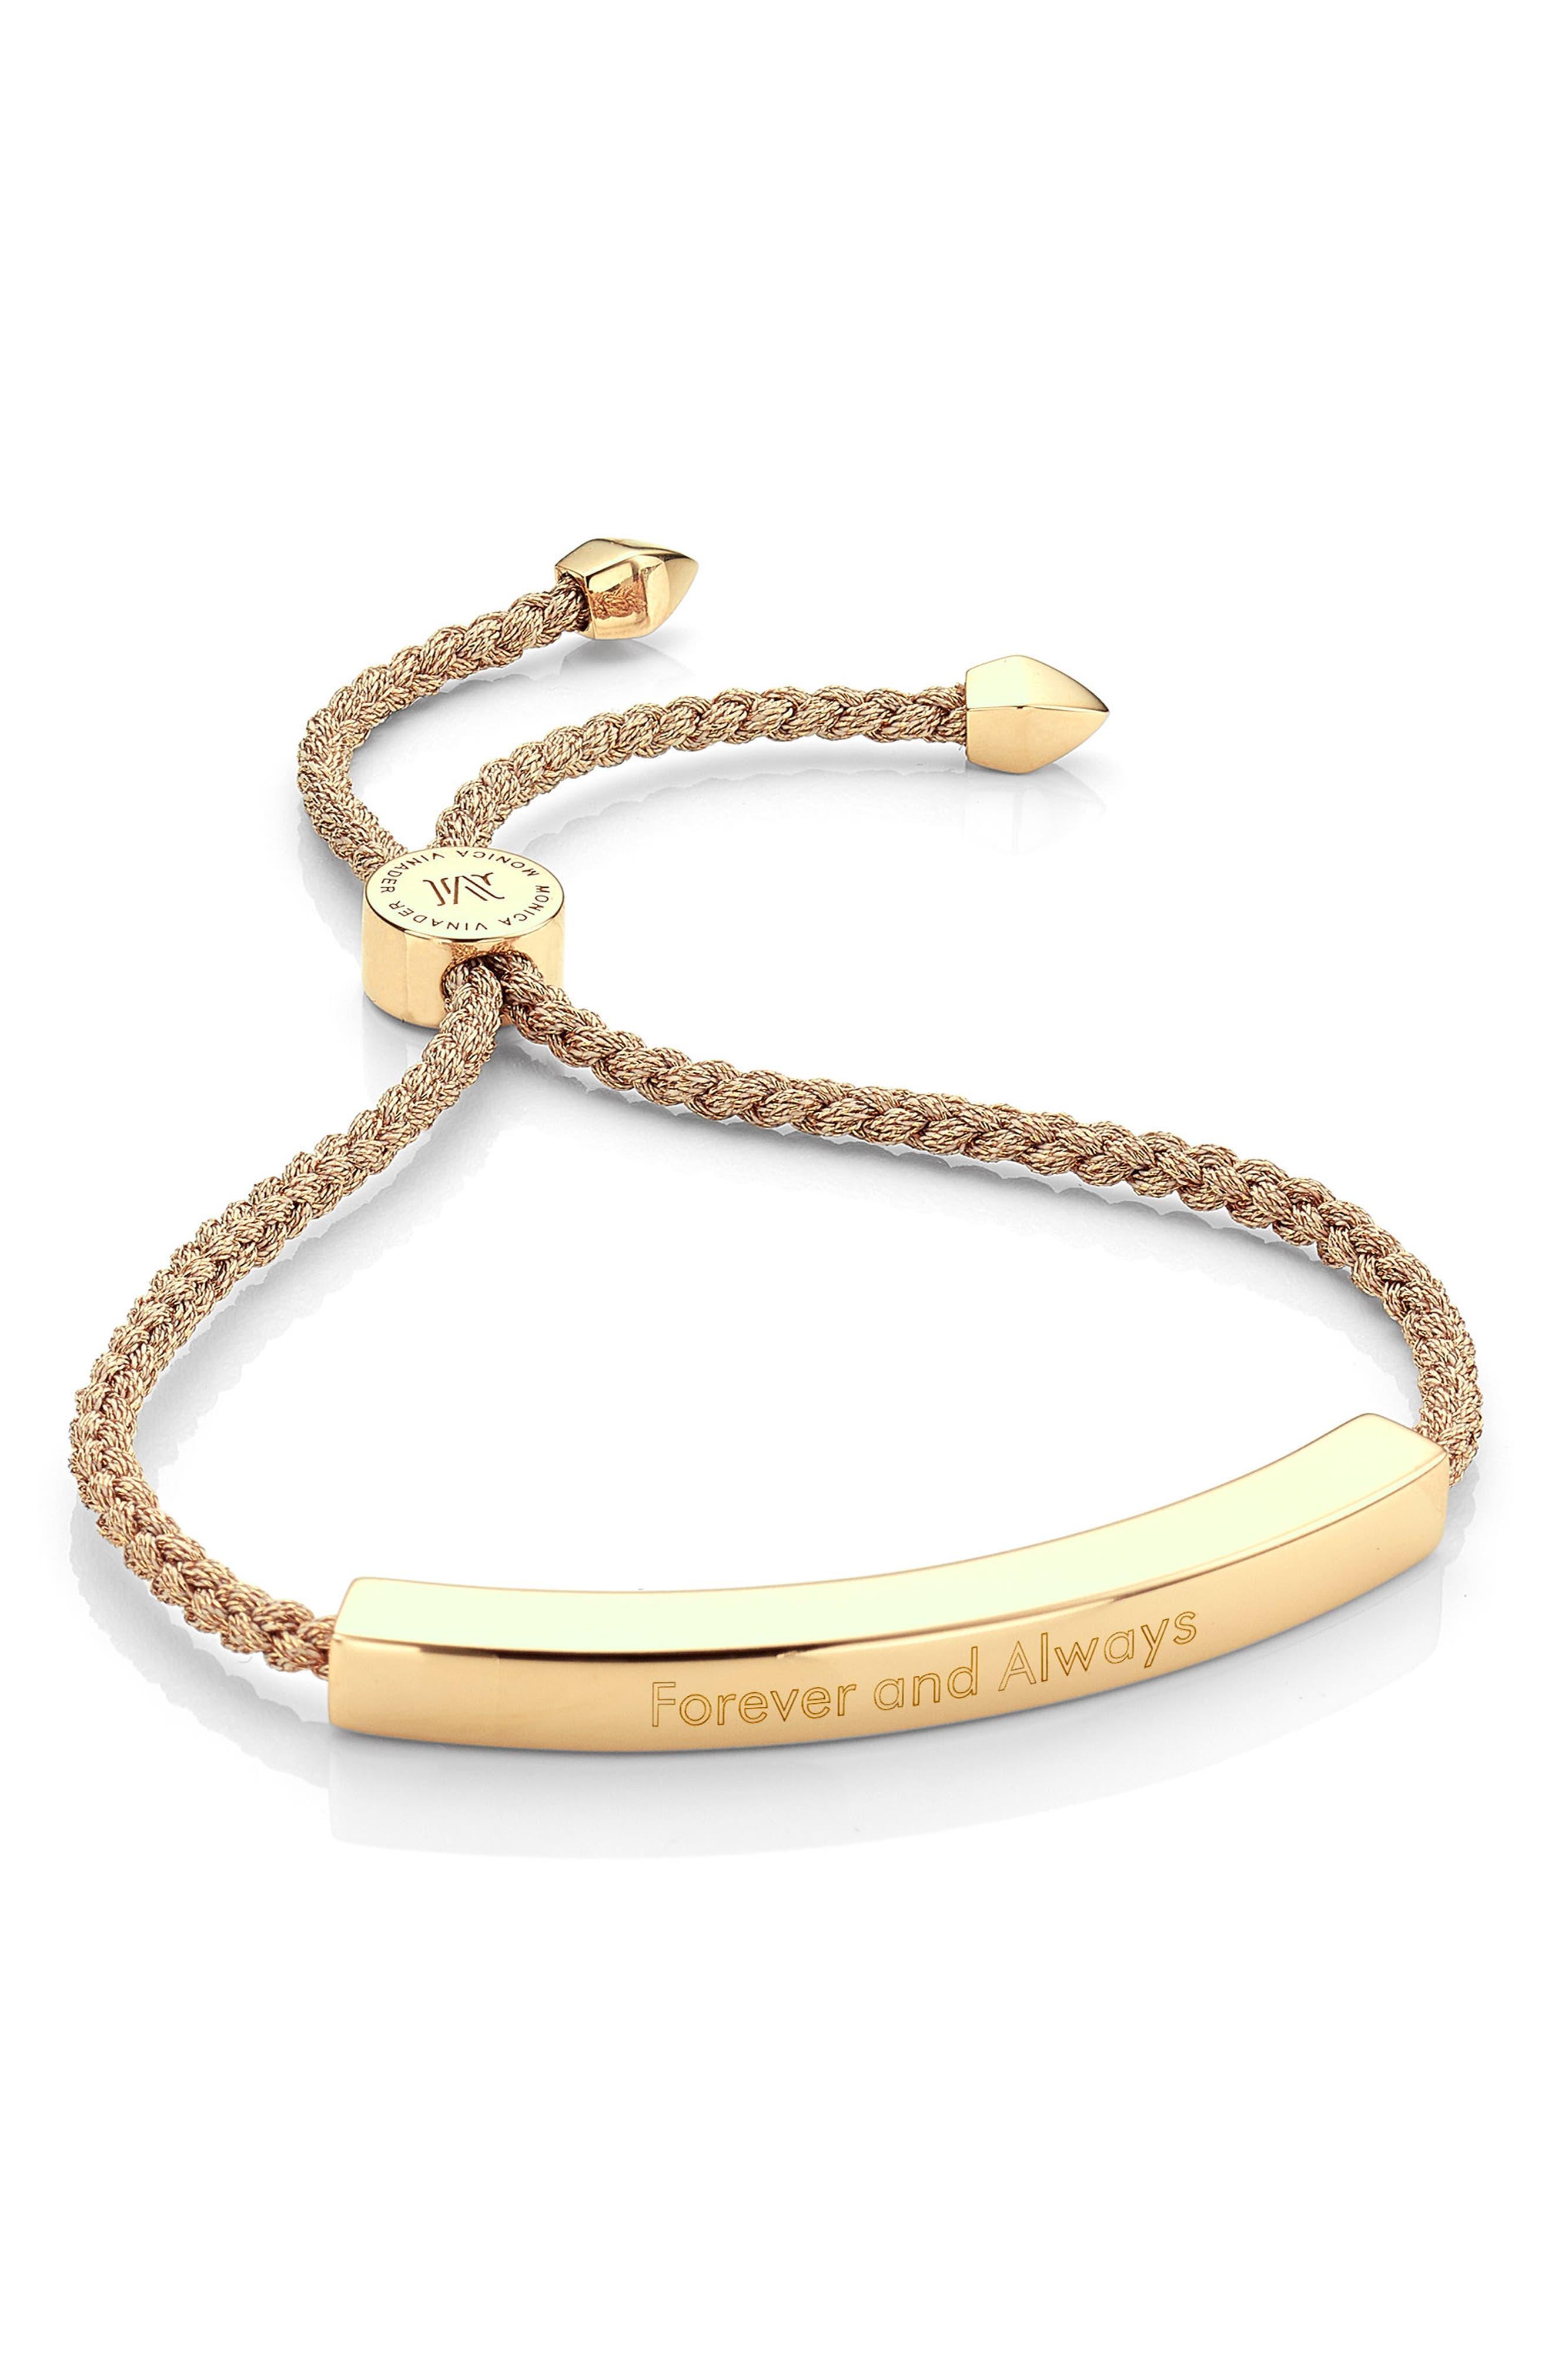 Engravable Linear Friendship Bracelet,                             Alternate thumbnail 2, color,                             METALLIC/ YELLOW GOLD